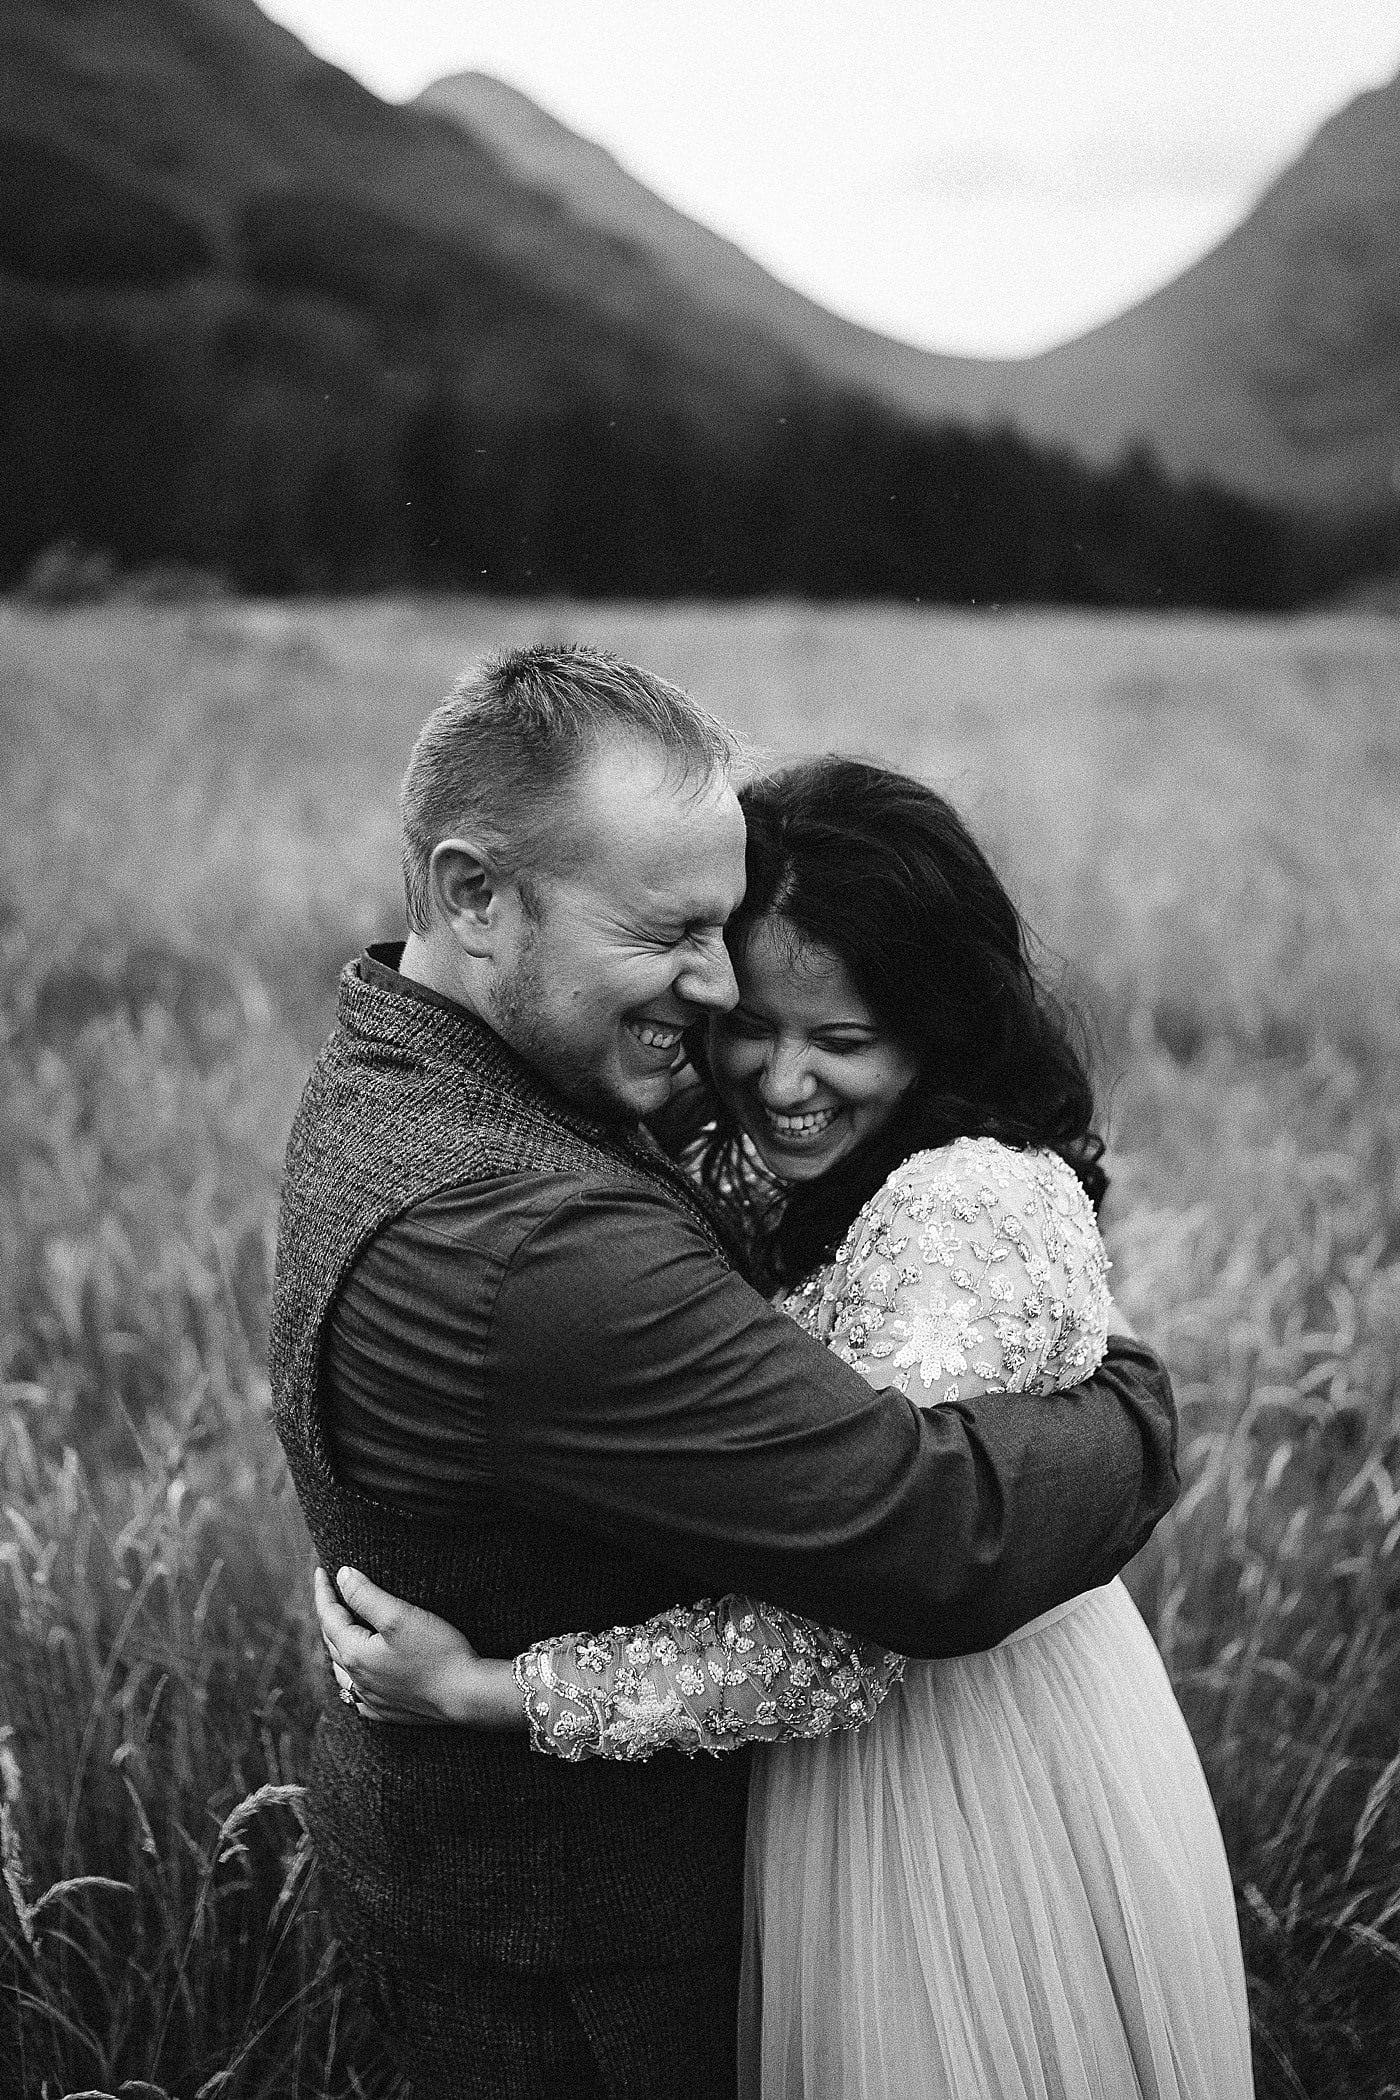 Glencoe elopement photographer. The Highlands make for a stunning location for a Scottish elopement. Scotland elopements. Adventure elopement in the Glencoe Mountains. Elopement Glen Coe